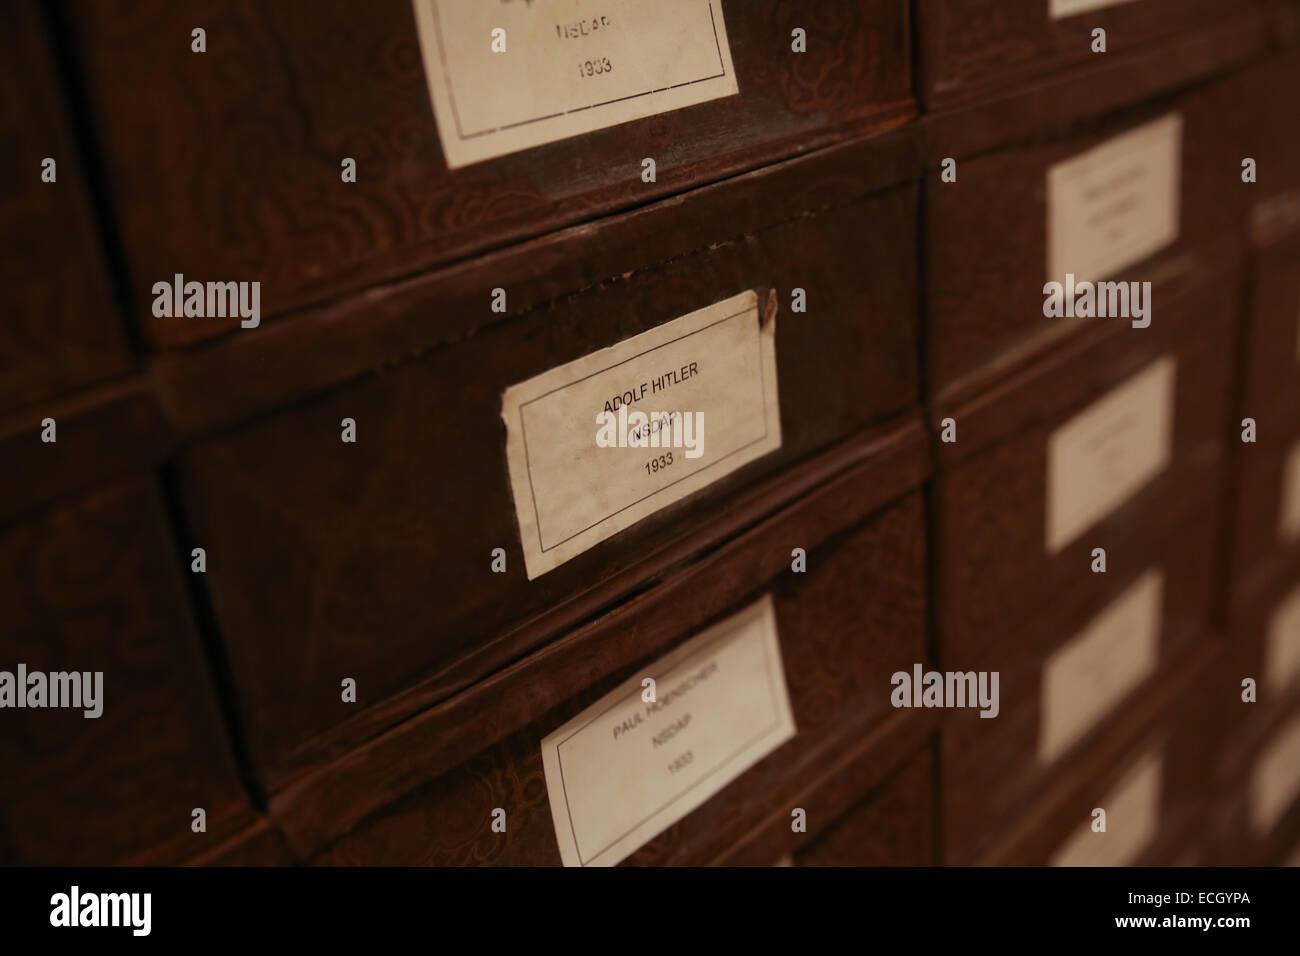 adolf hitler box reichstag building basement - Stock Image